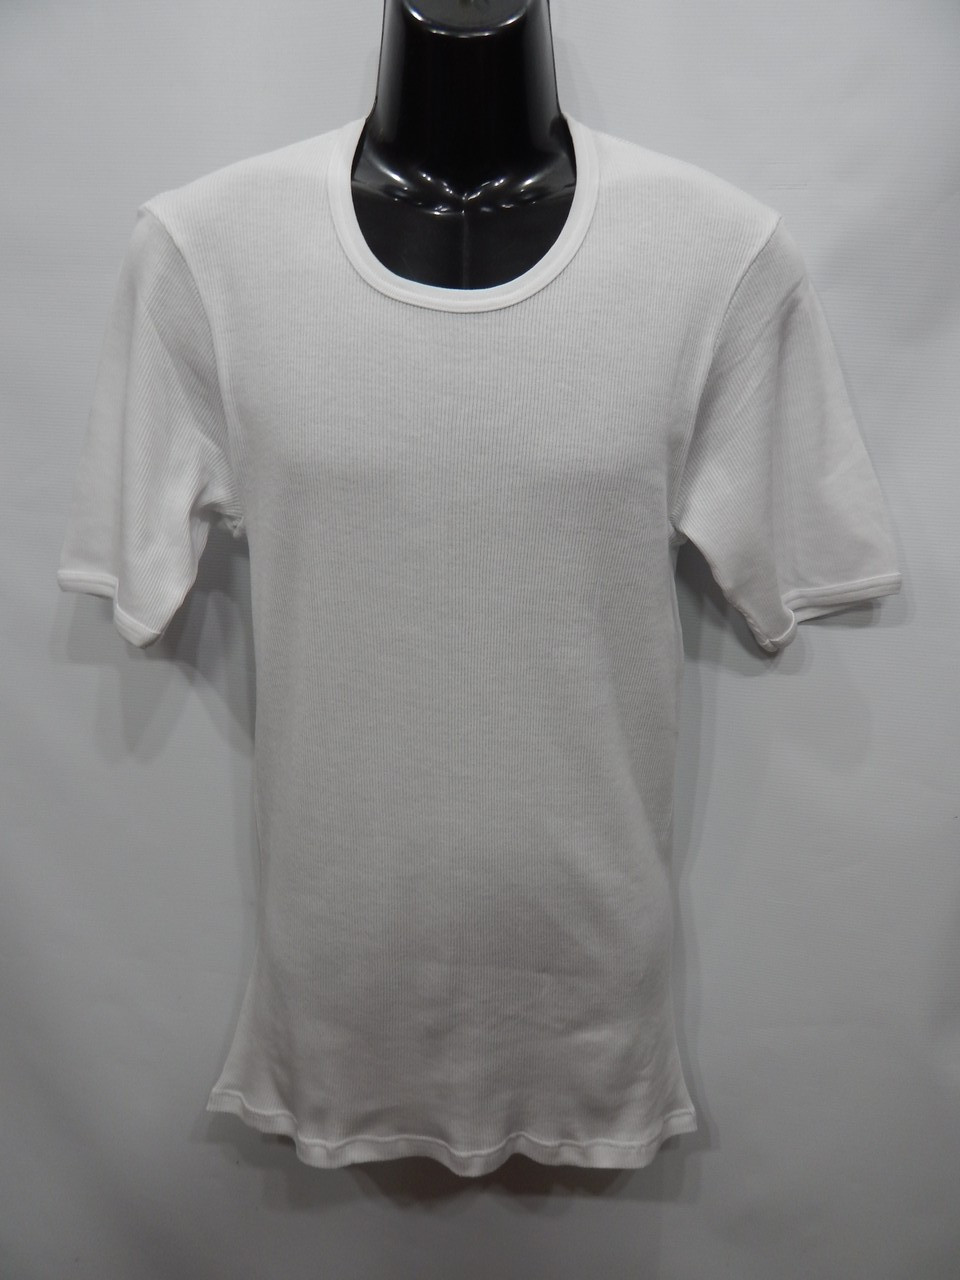 Мужская футболка легкая Senator р.48 401мф